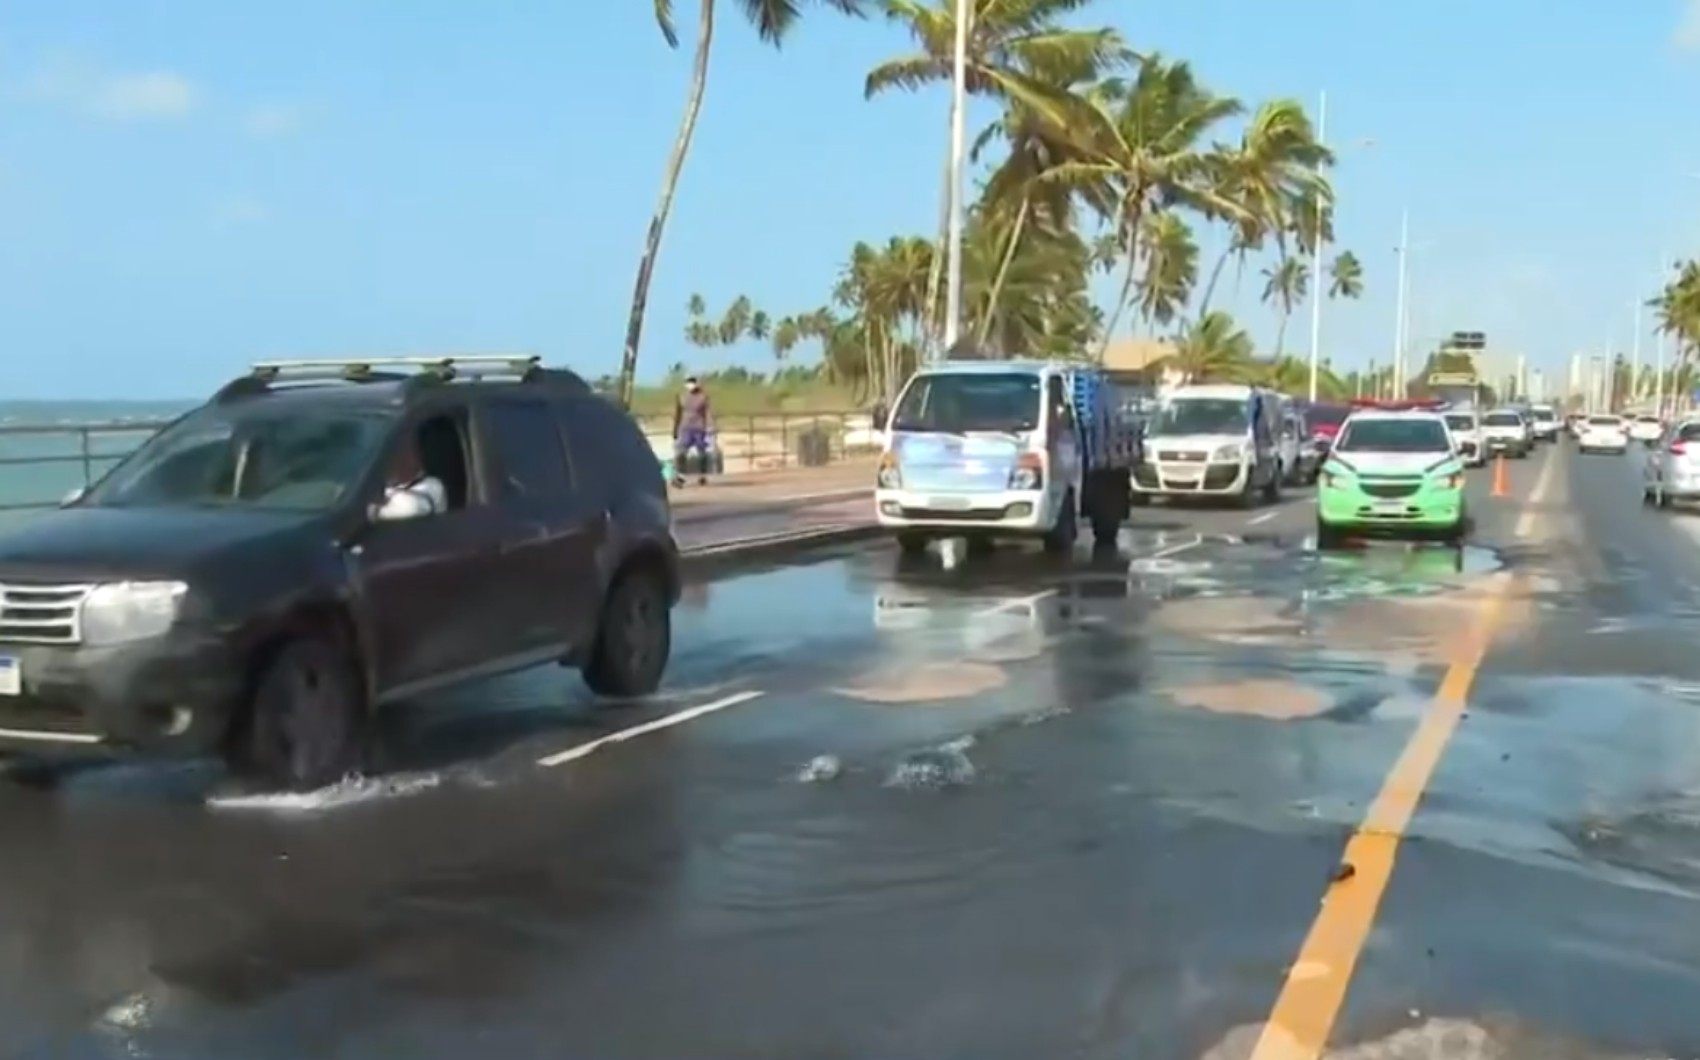 Rompimento de adutora causa vazamento de água e rompe asfalto na orla de Salvador